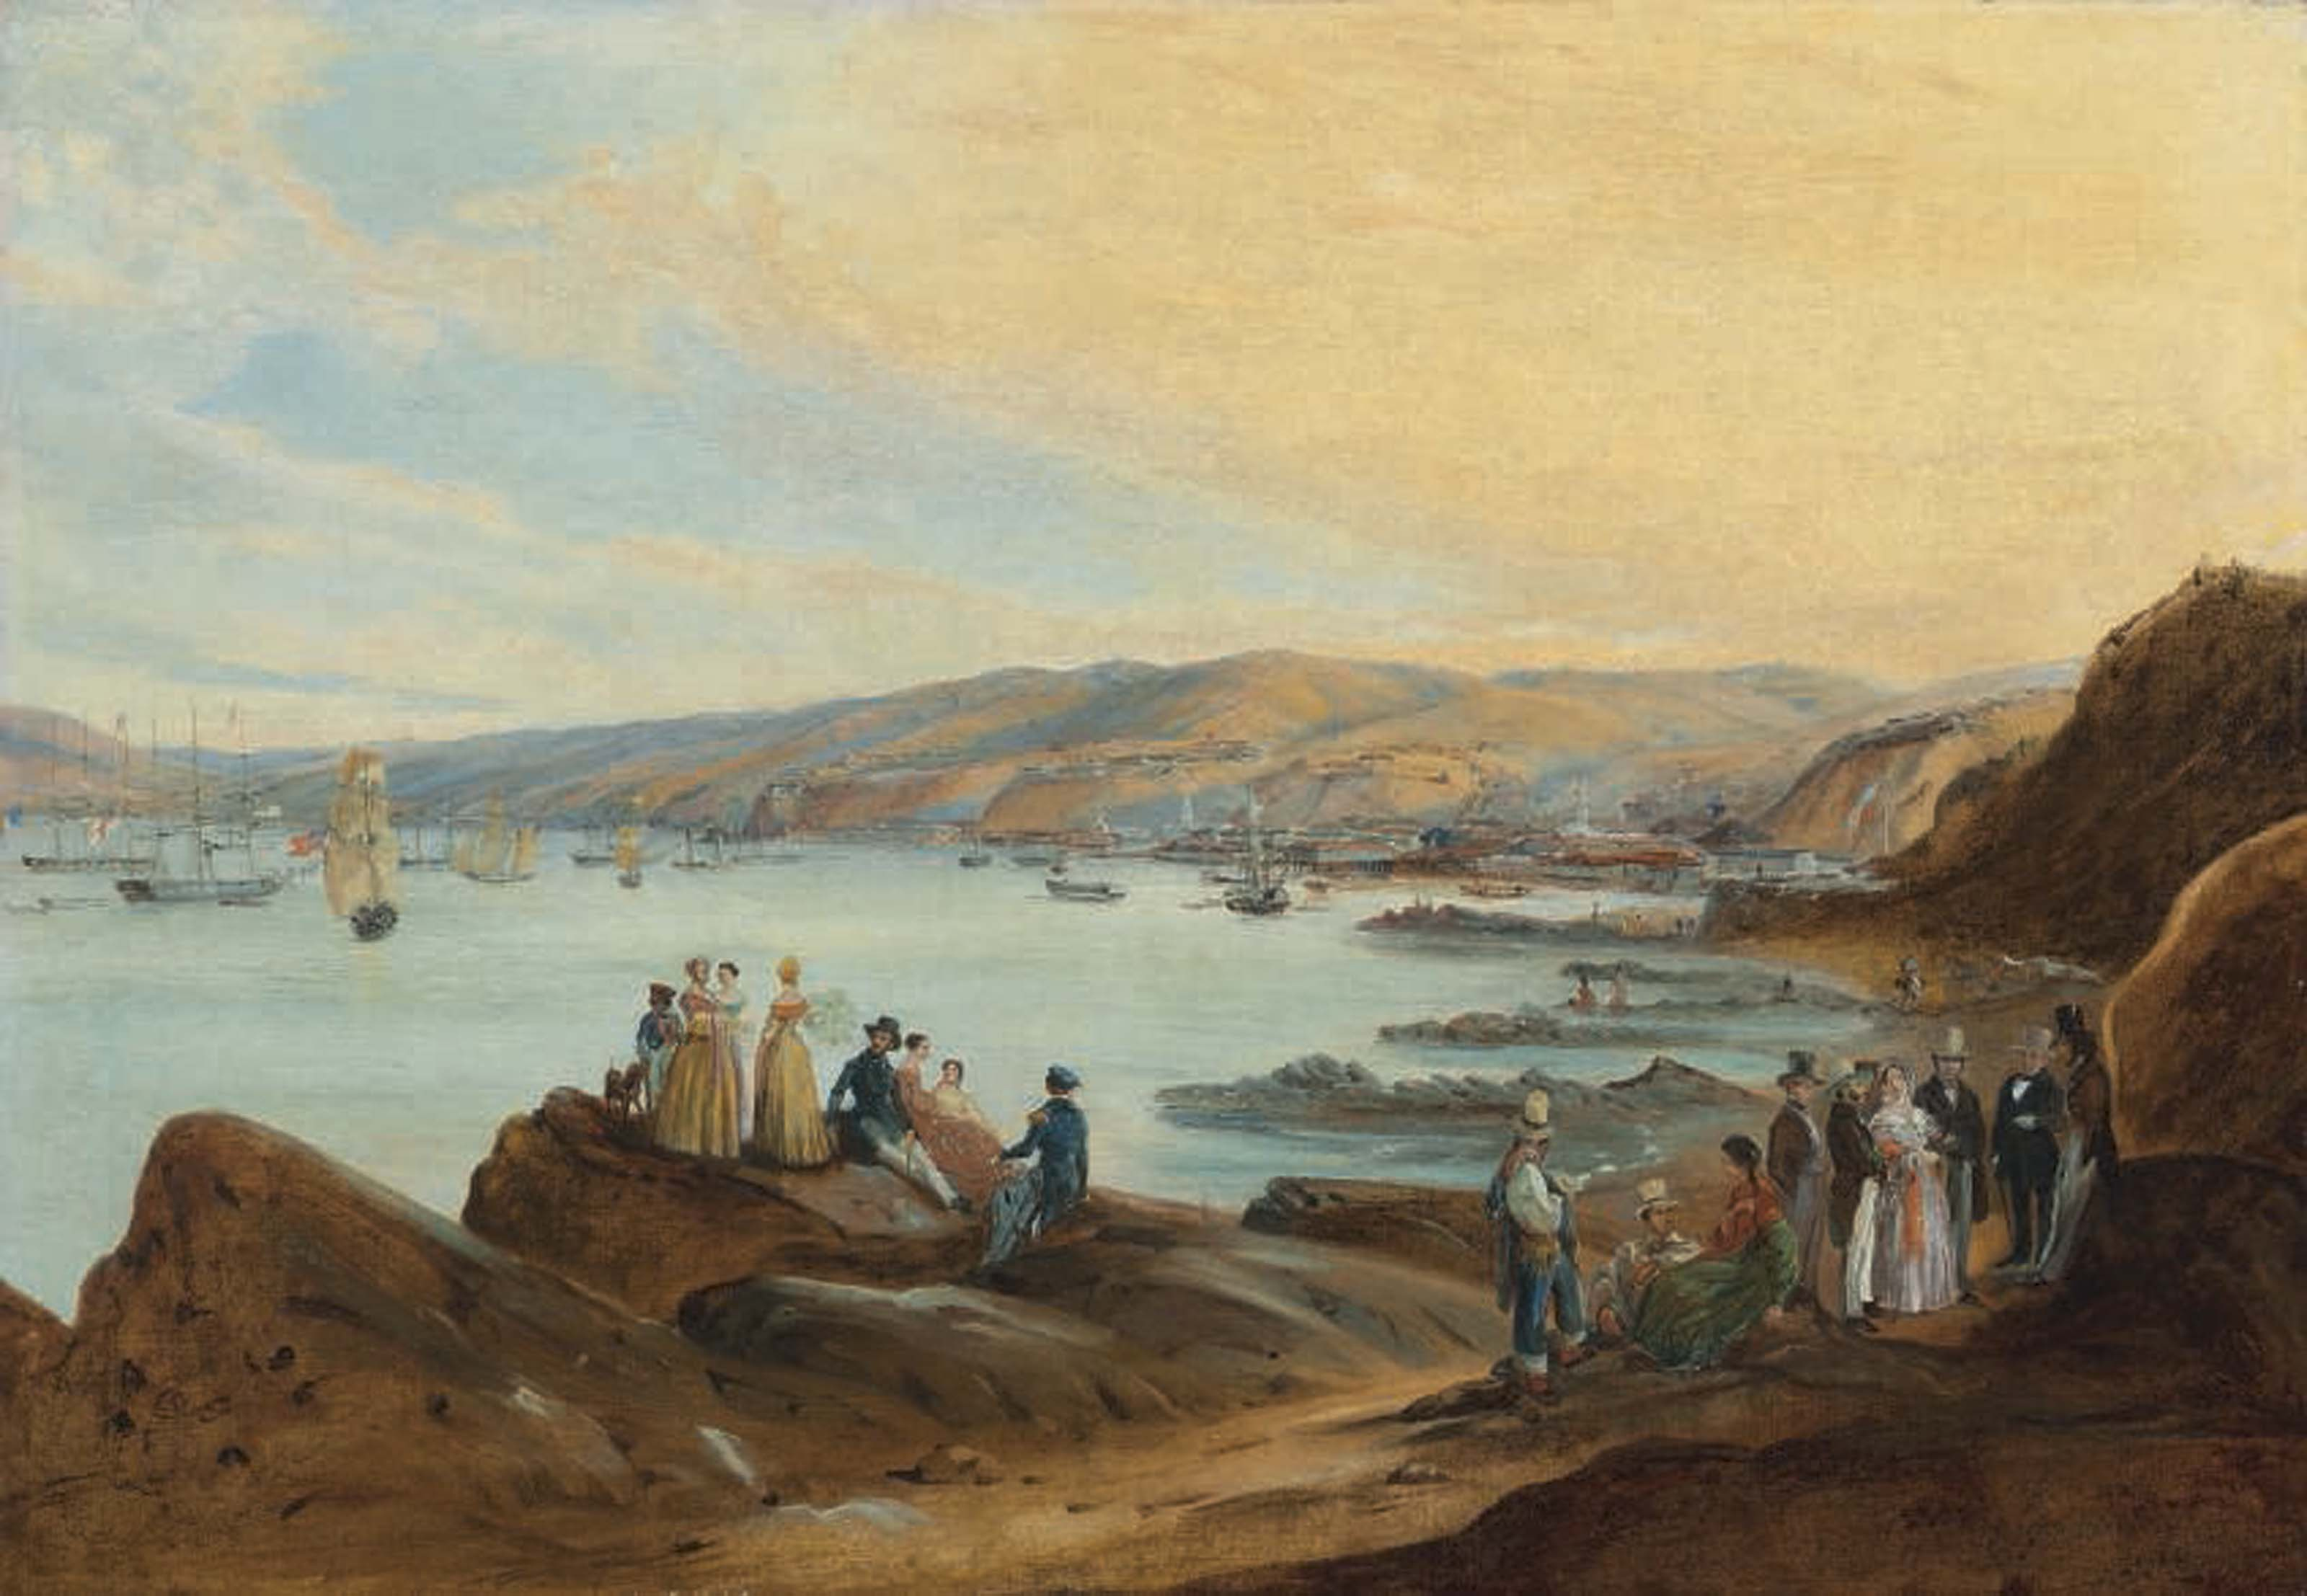 The beach of El Membrillo, Valparaíso